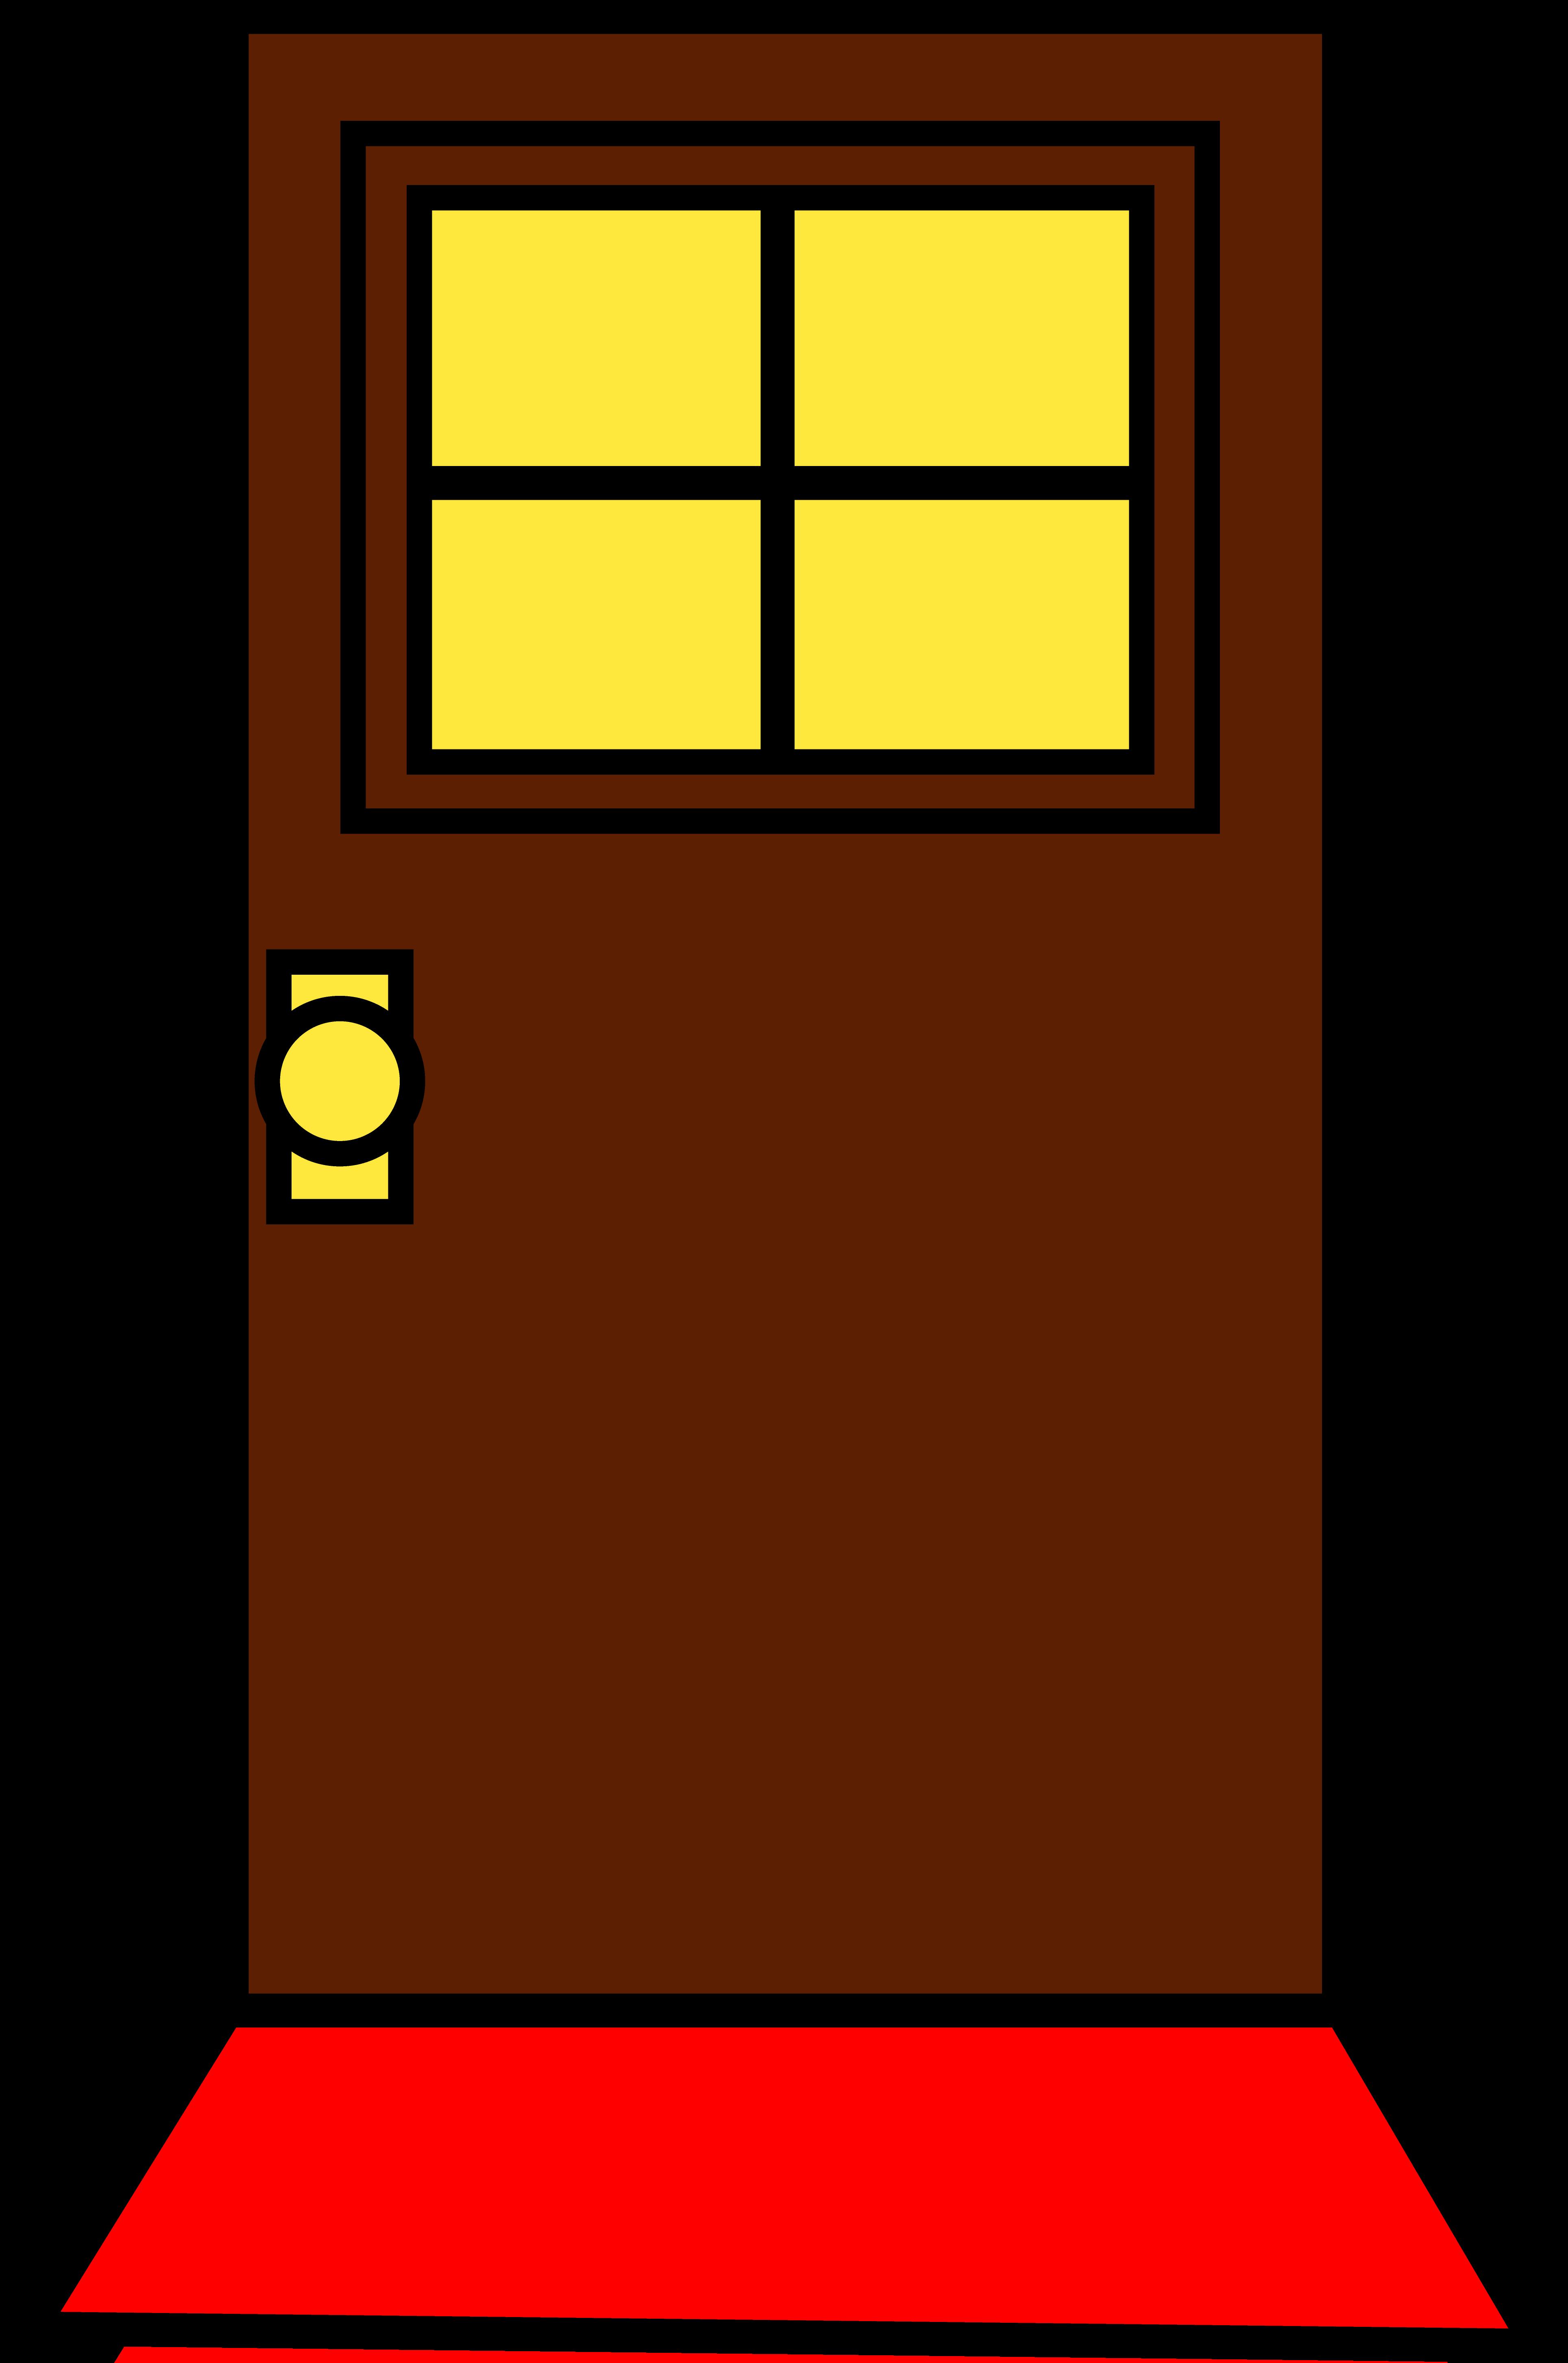 Front Door Clipart | Clipart Panda - Free Clipart Images